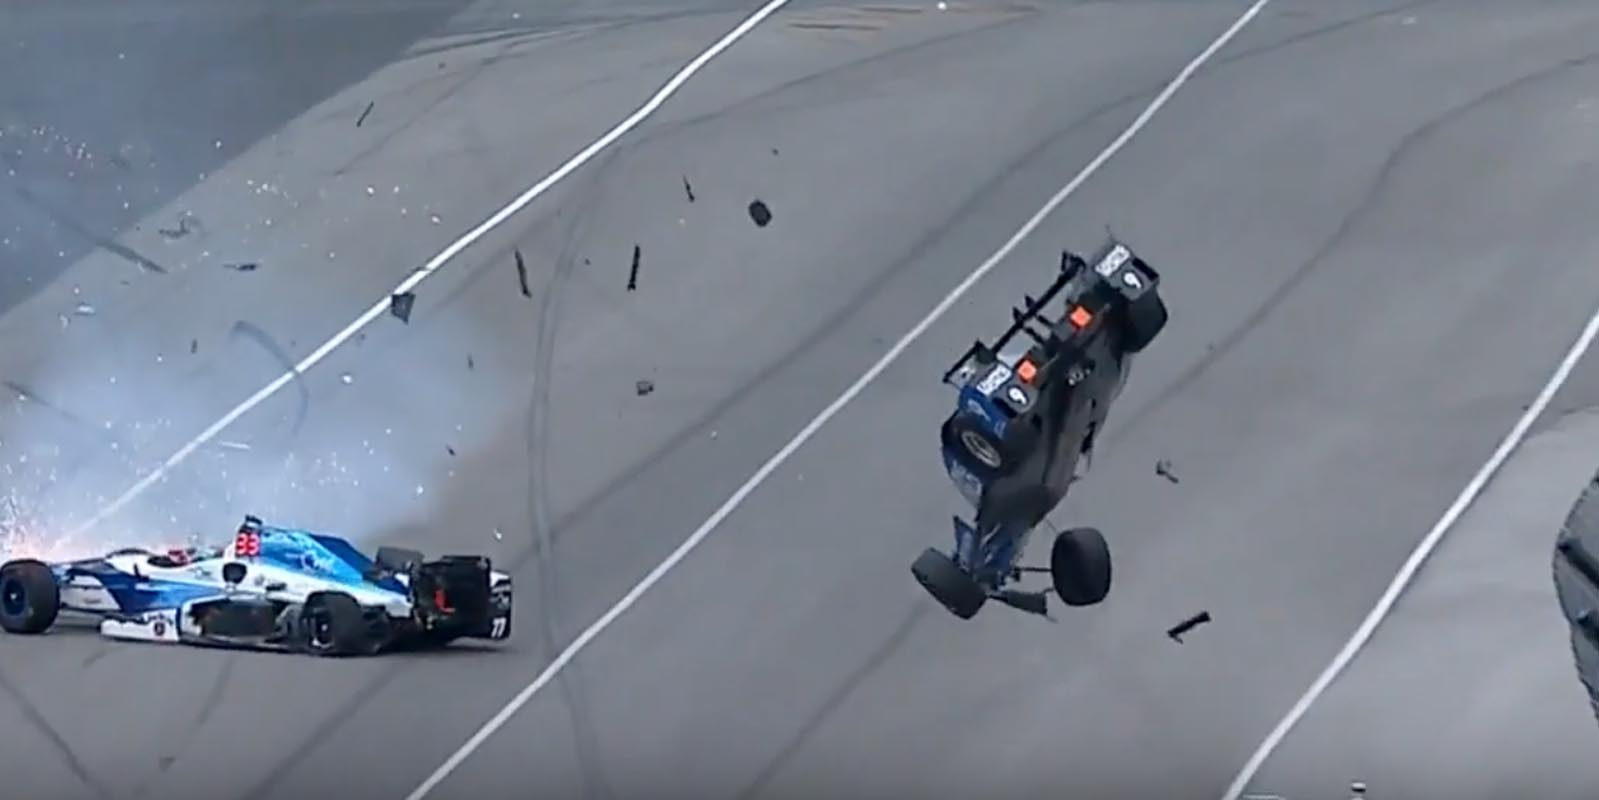 Photo of Δείτε μία τρομακτική σύγκρουση στο Indy 500 [vid]